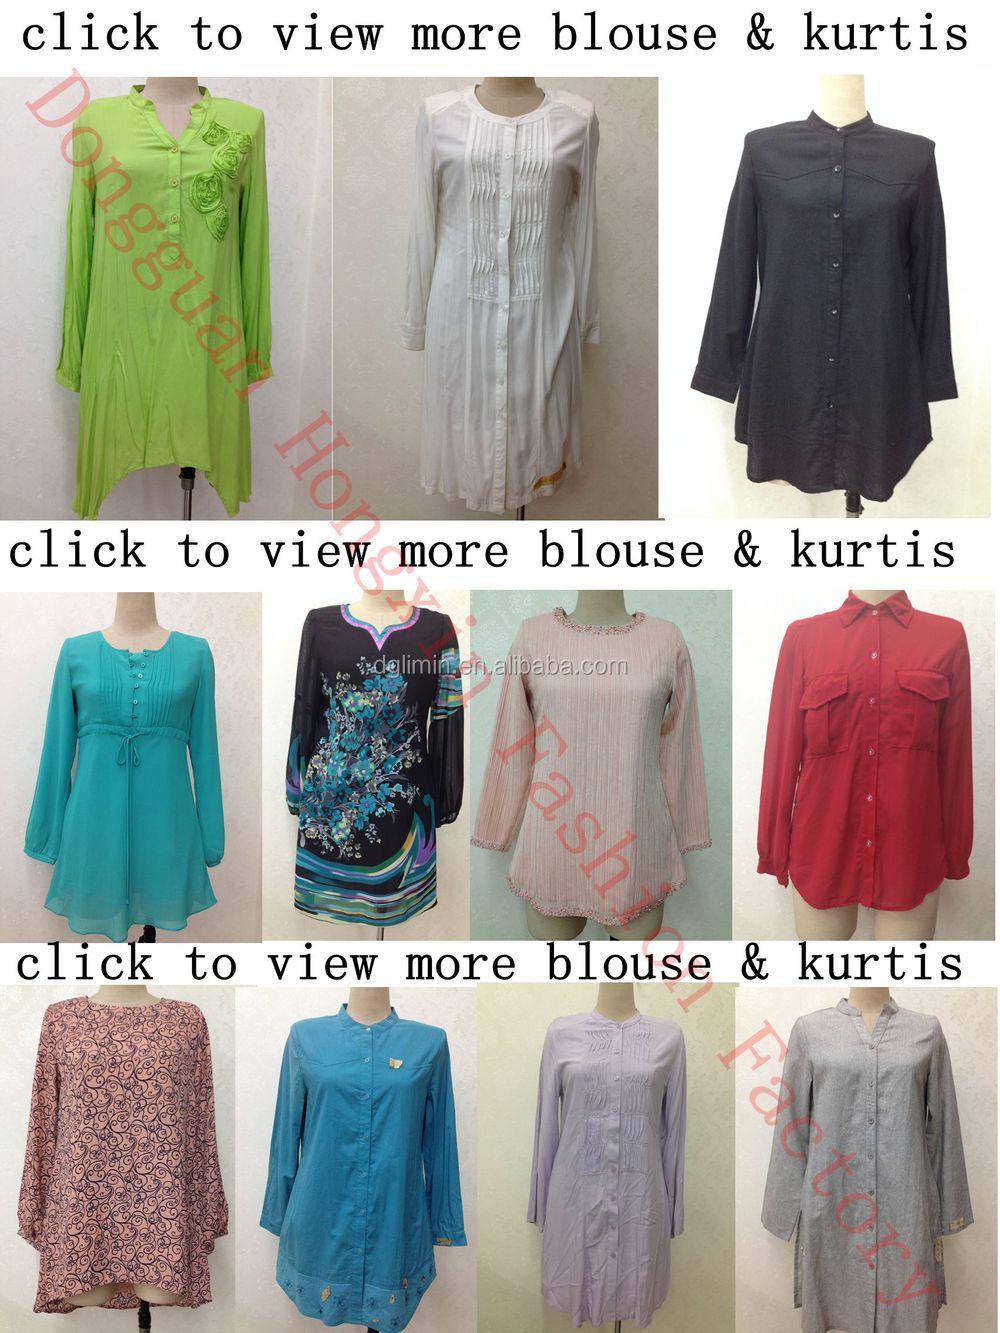 Arabian robe / mini jubah pakaian / baju kurti / baju muslimah top